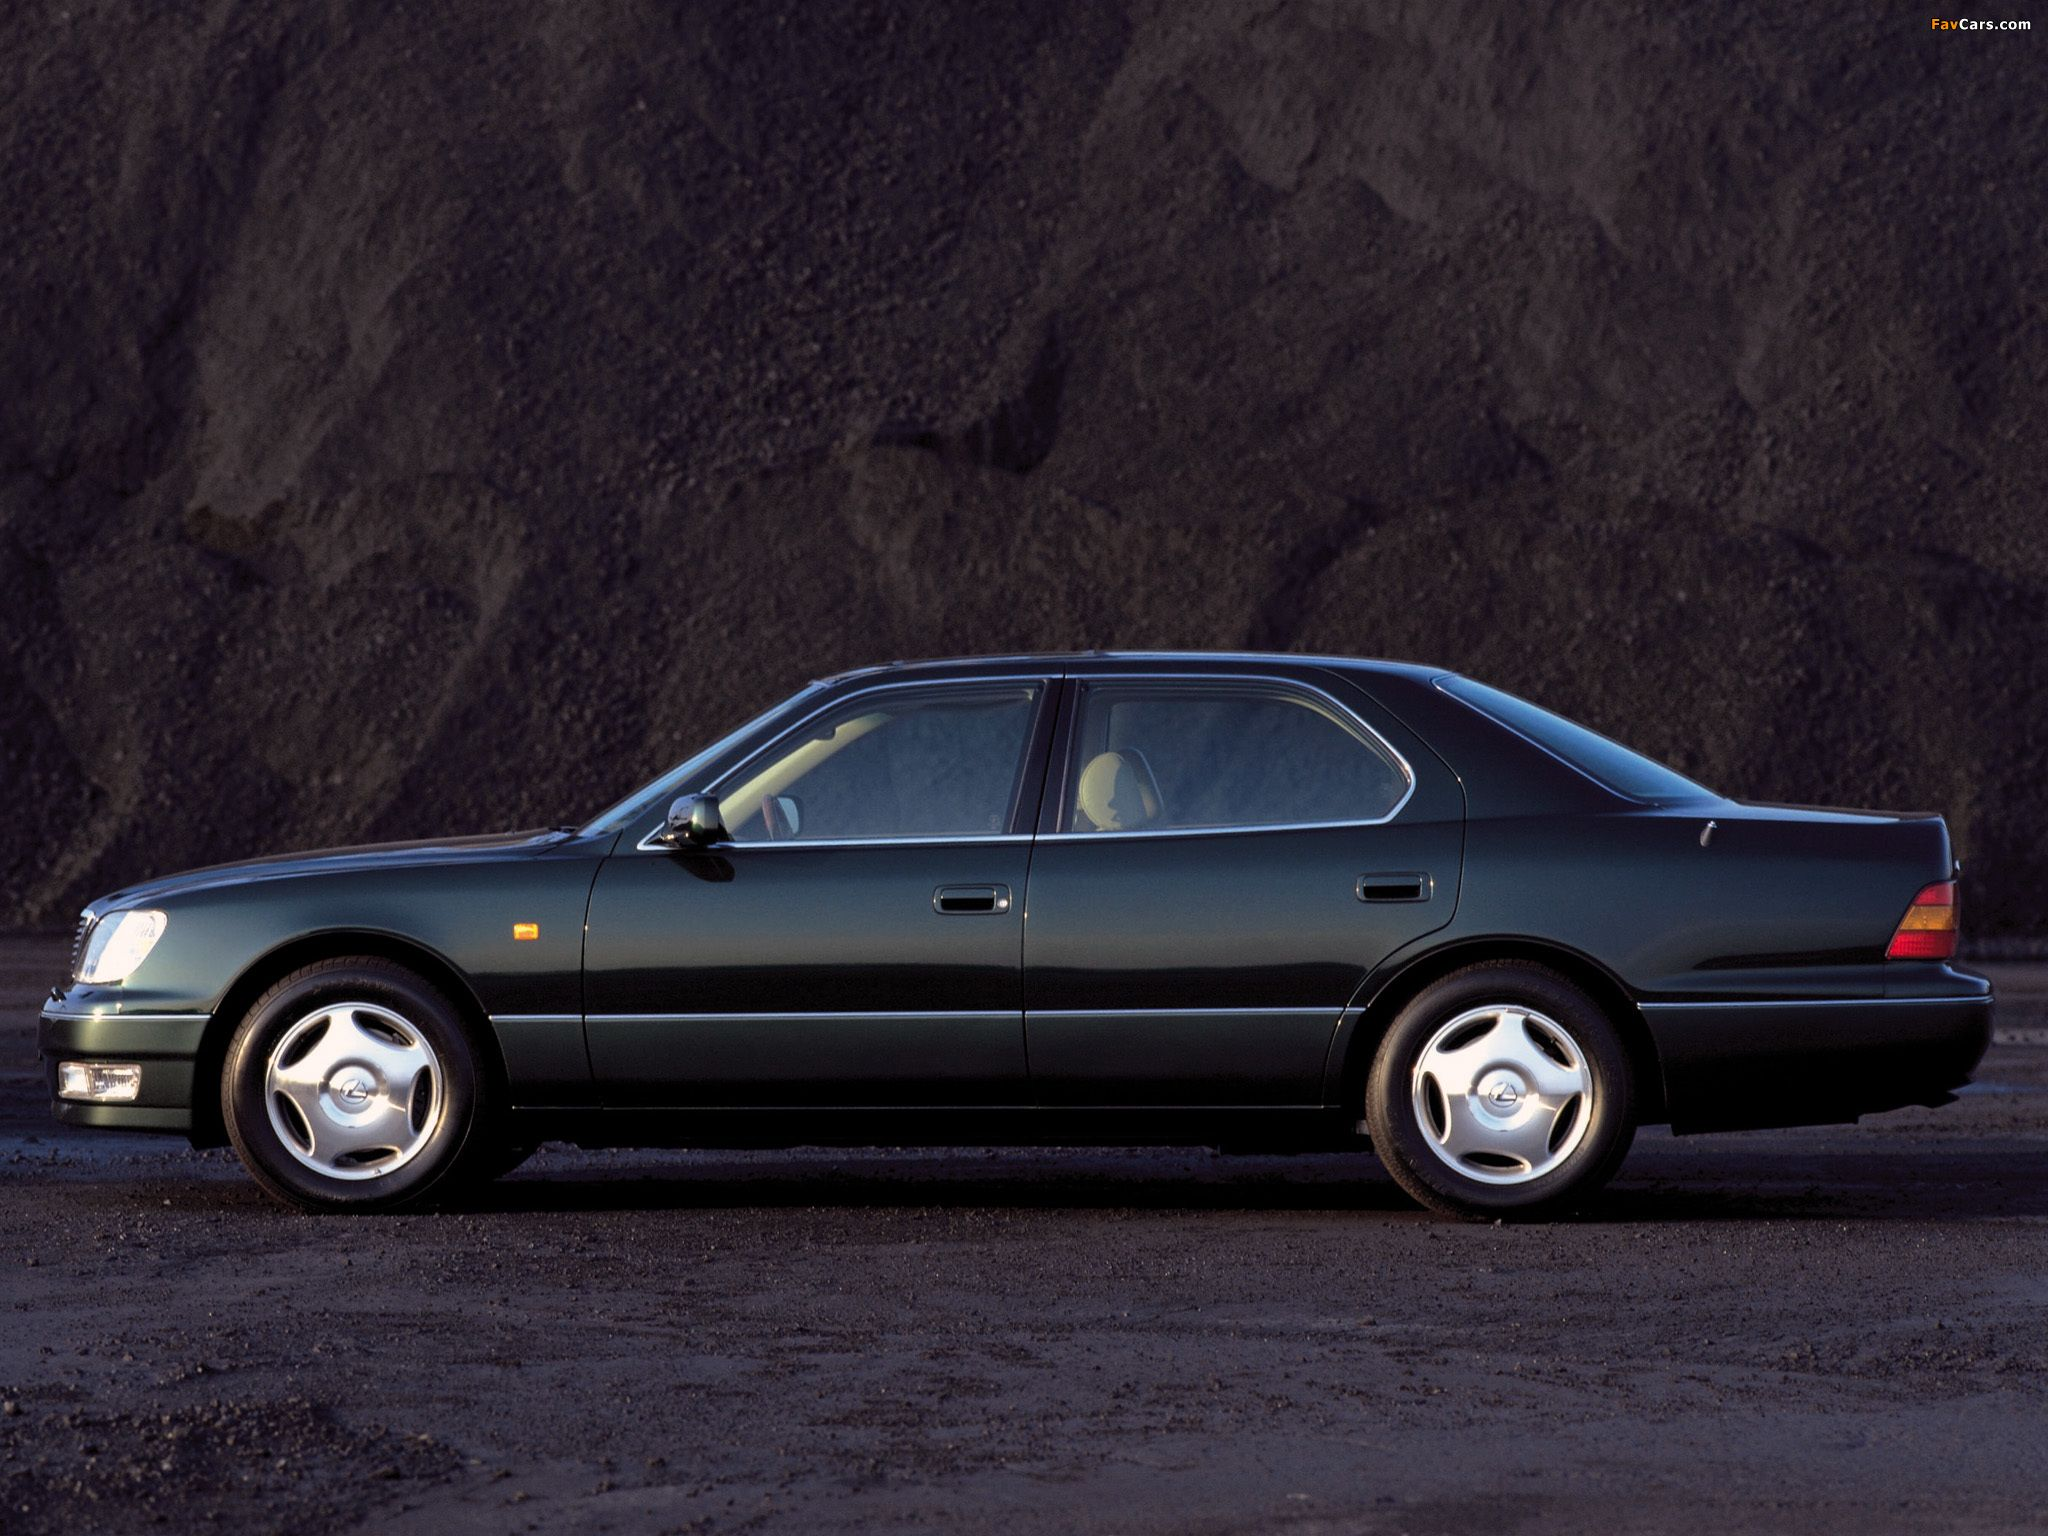 1997 lexus ls400 lexus gs300 fuel economy japanese cars car photos model [ 2048 x 1536 Pixel ]